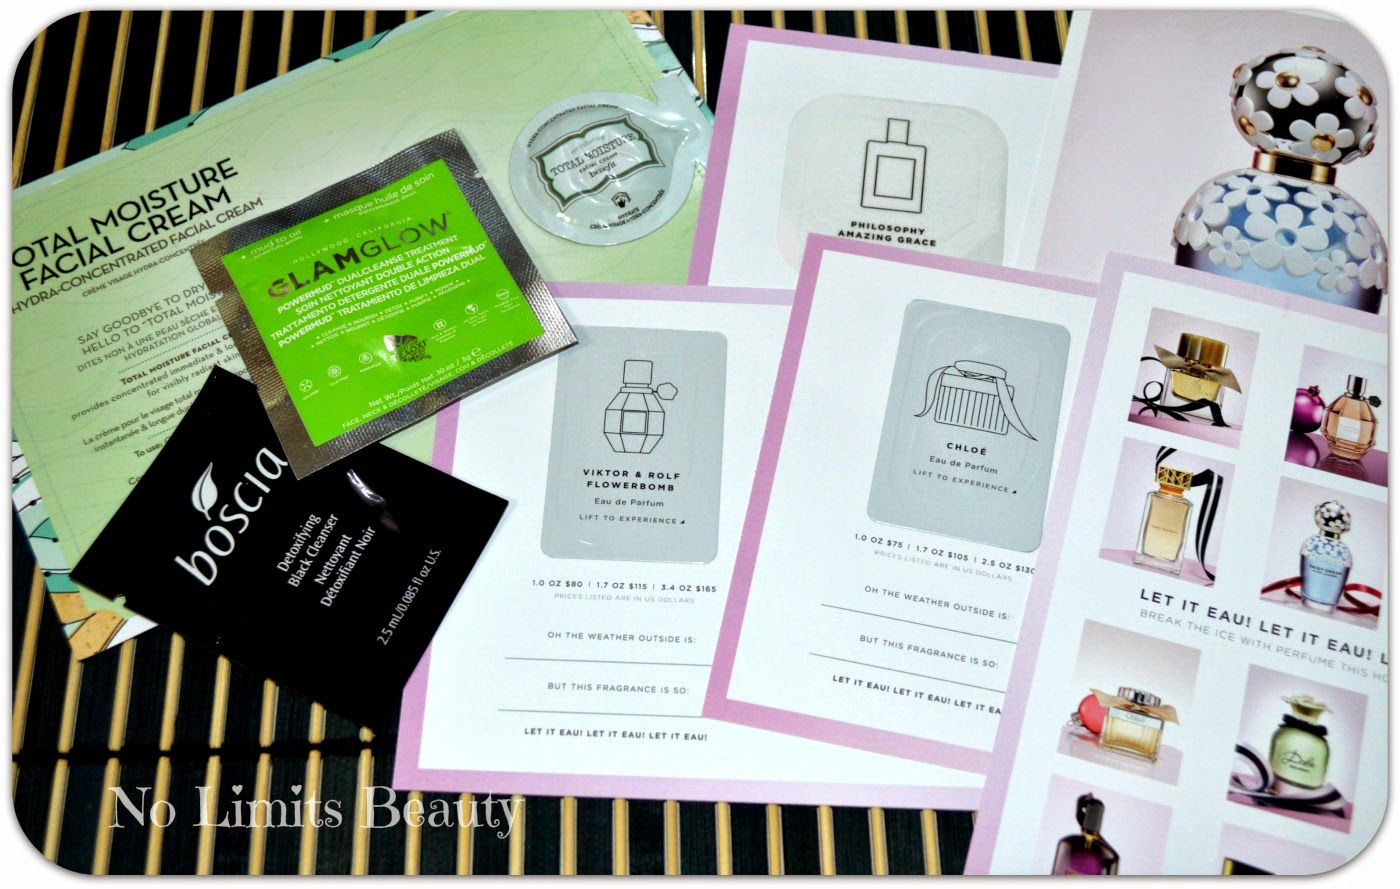 Compra con Shipito en Sephora USA: muestras